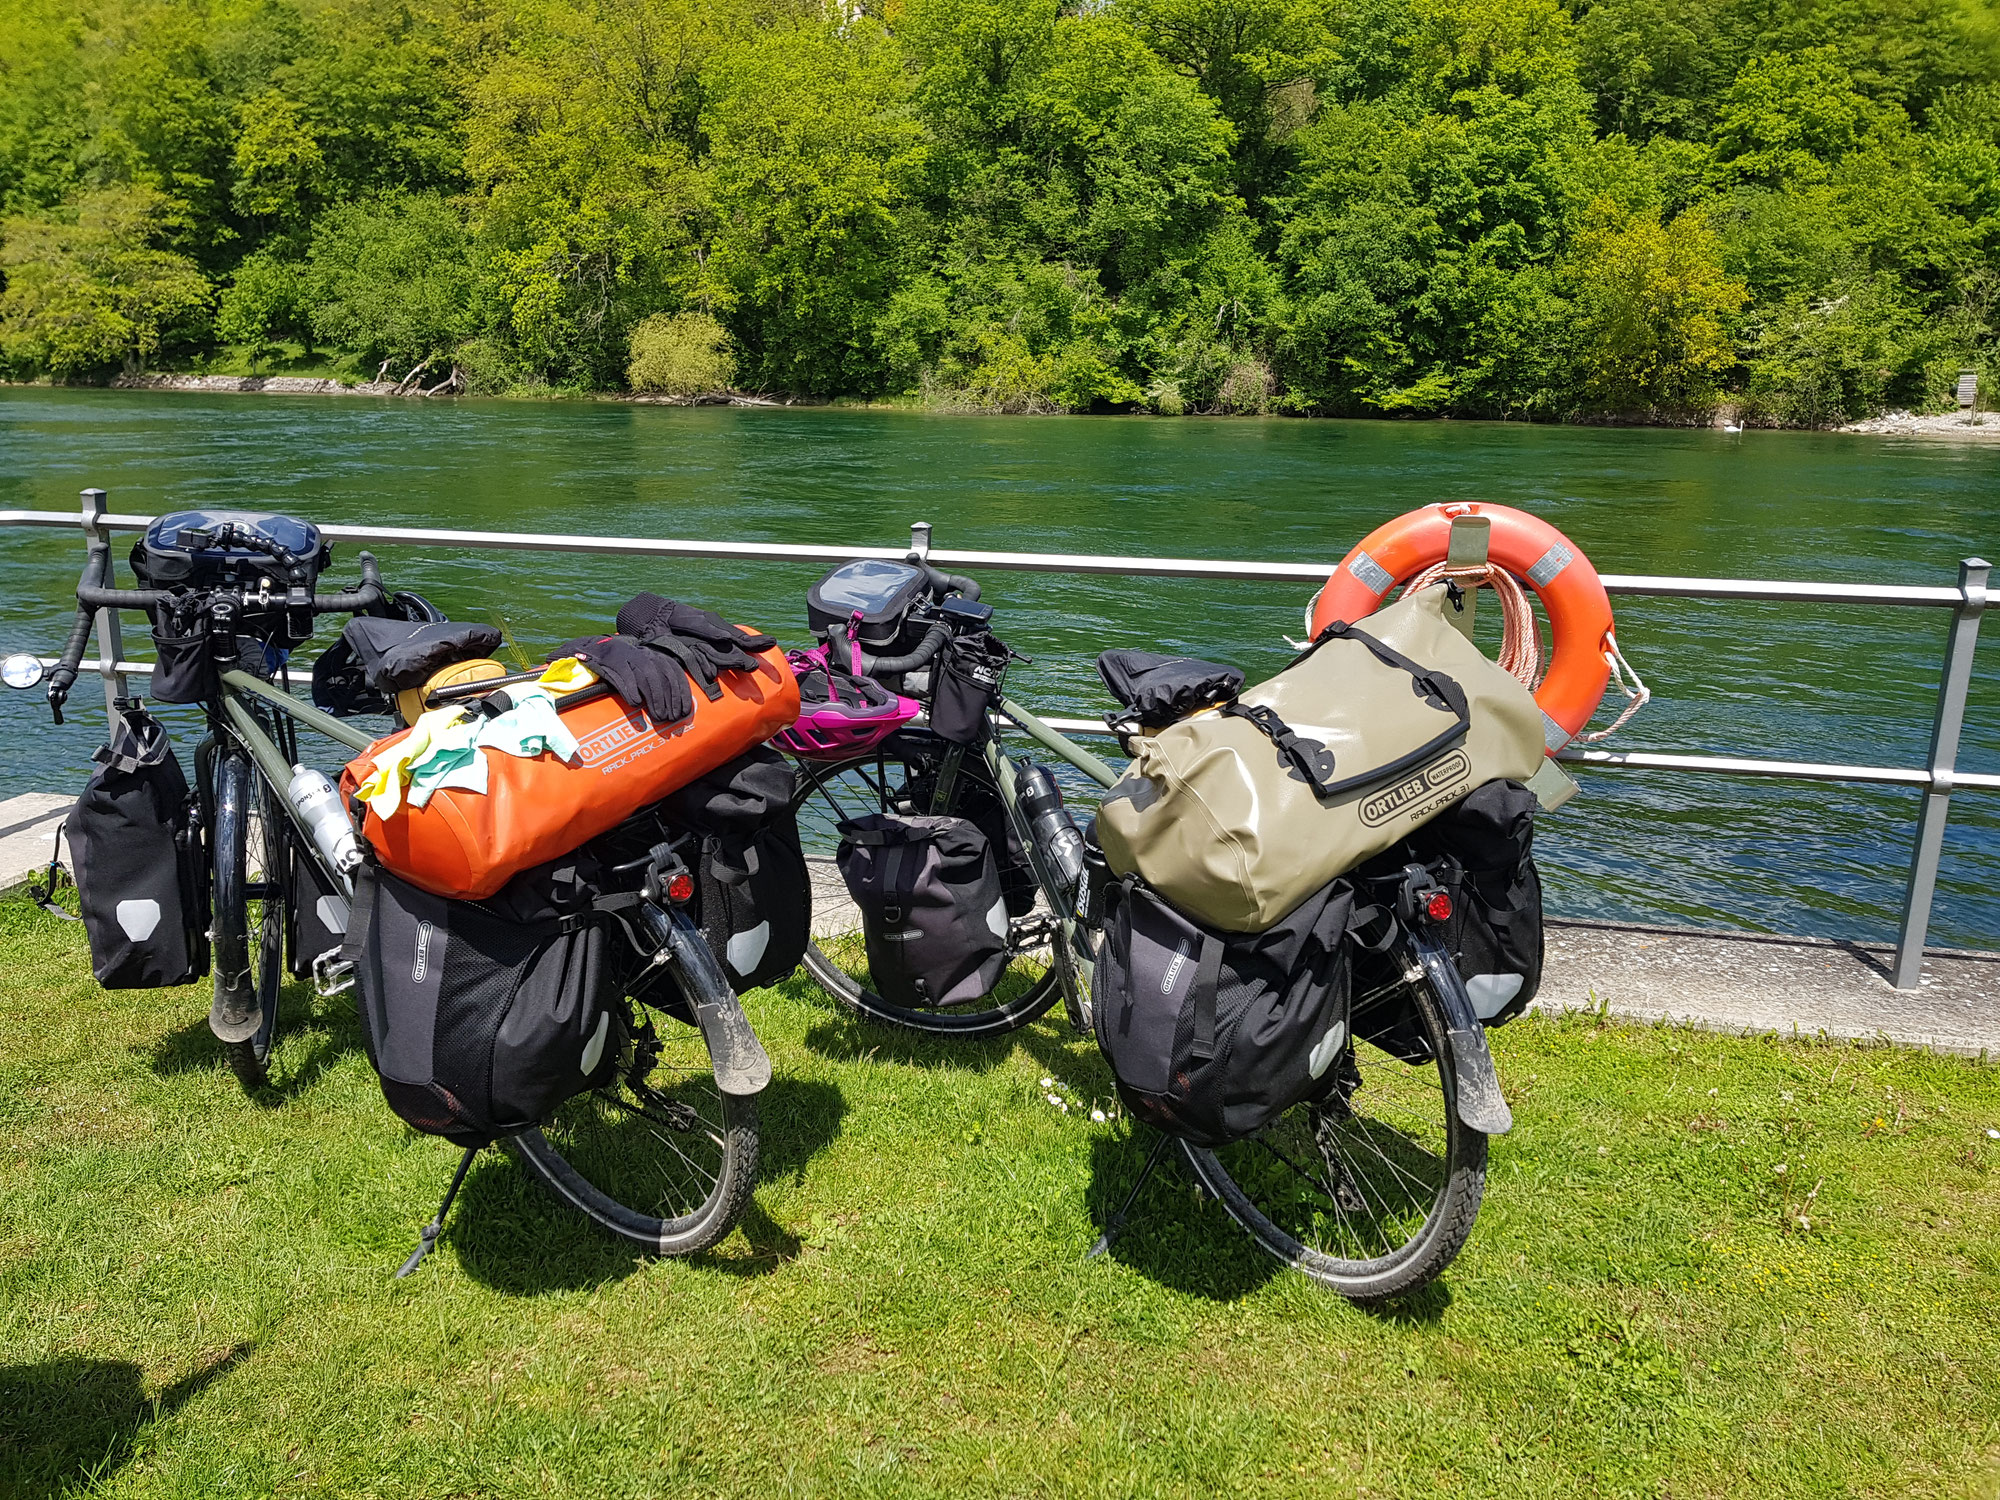 Biketrekking entlang dem Rhein